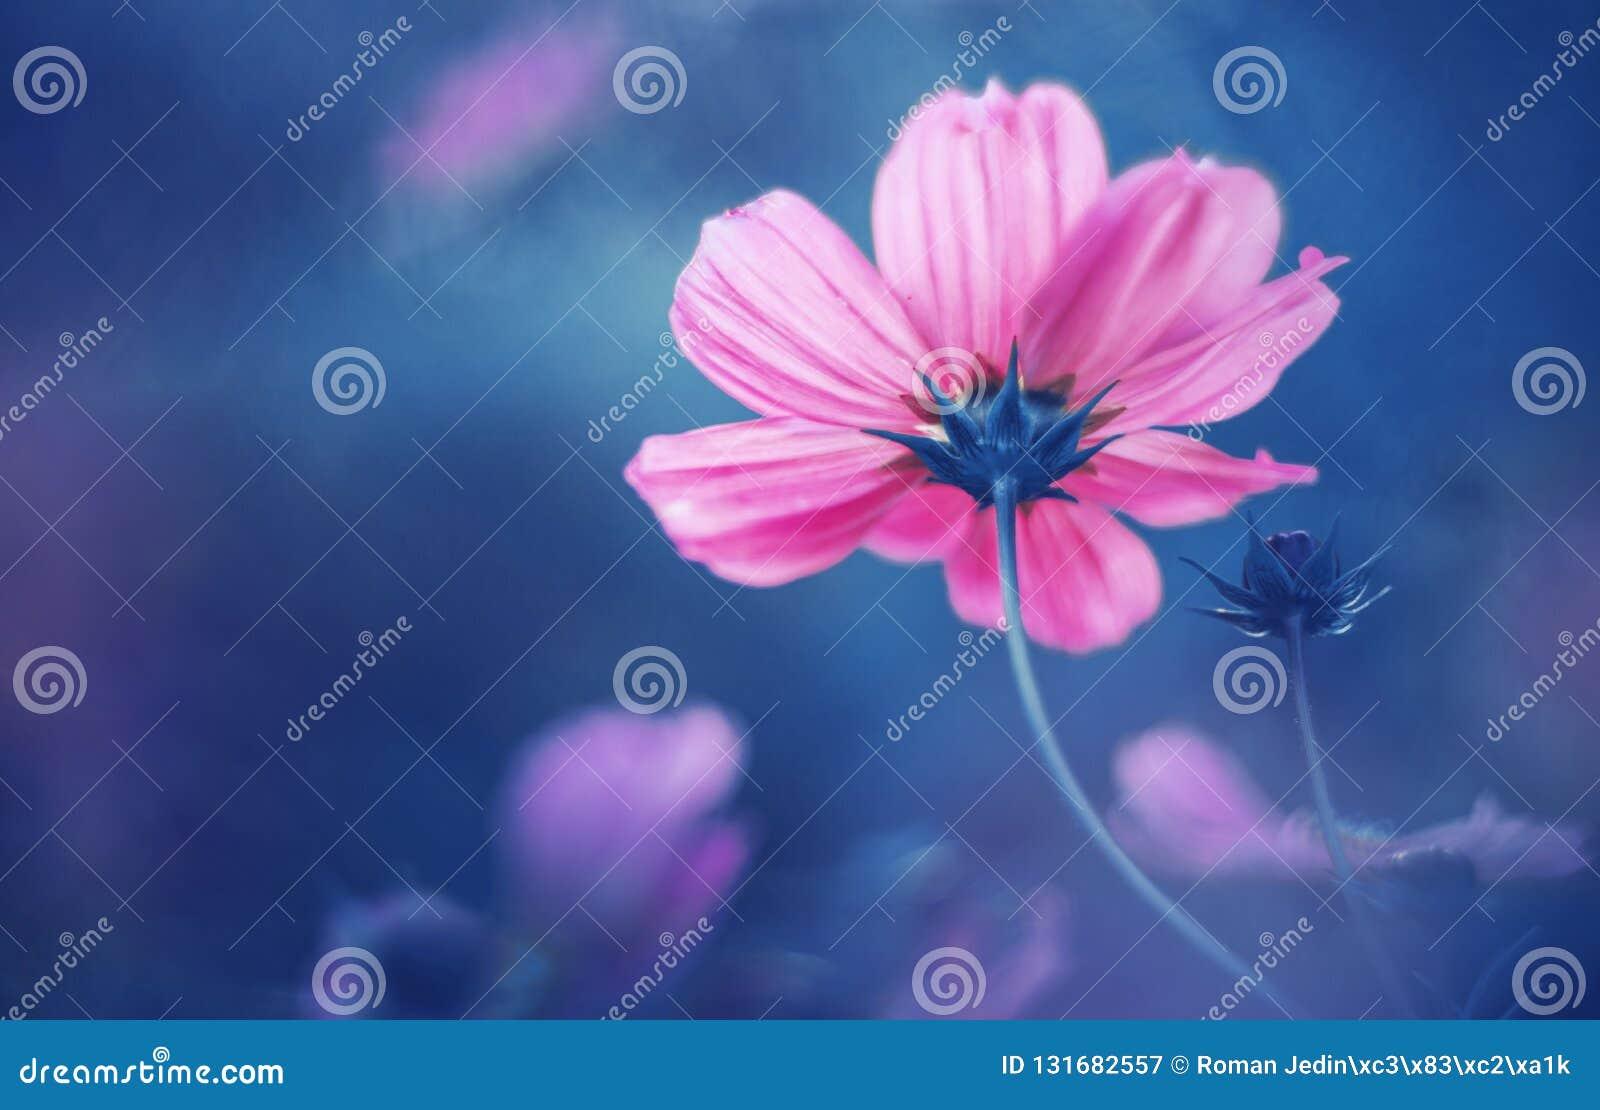 Rêve de rose de fleur